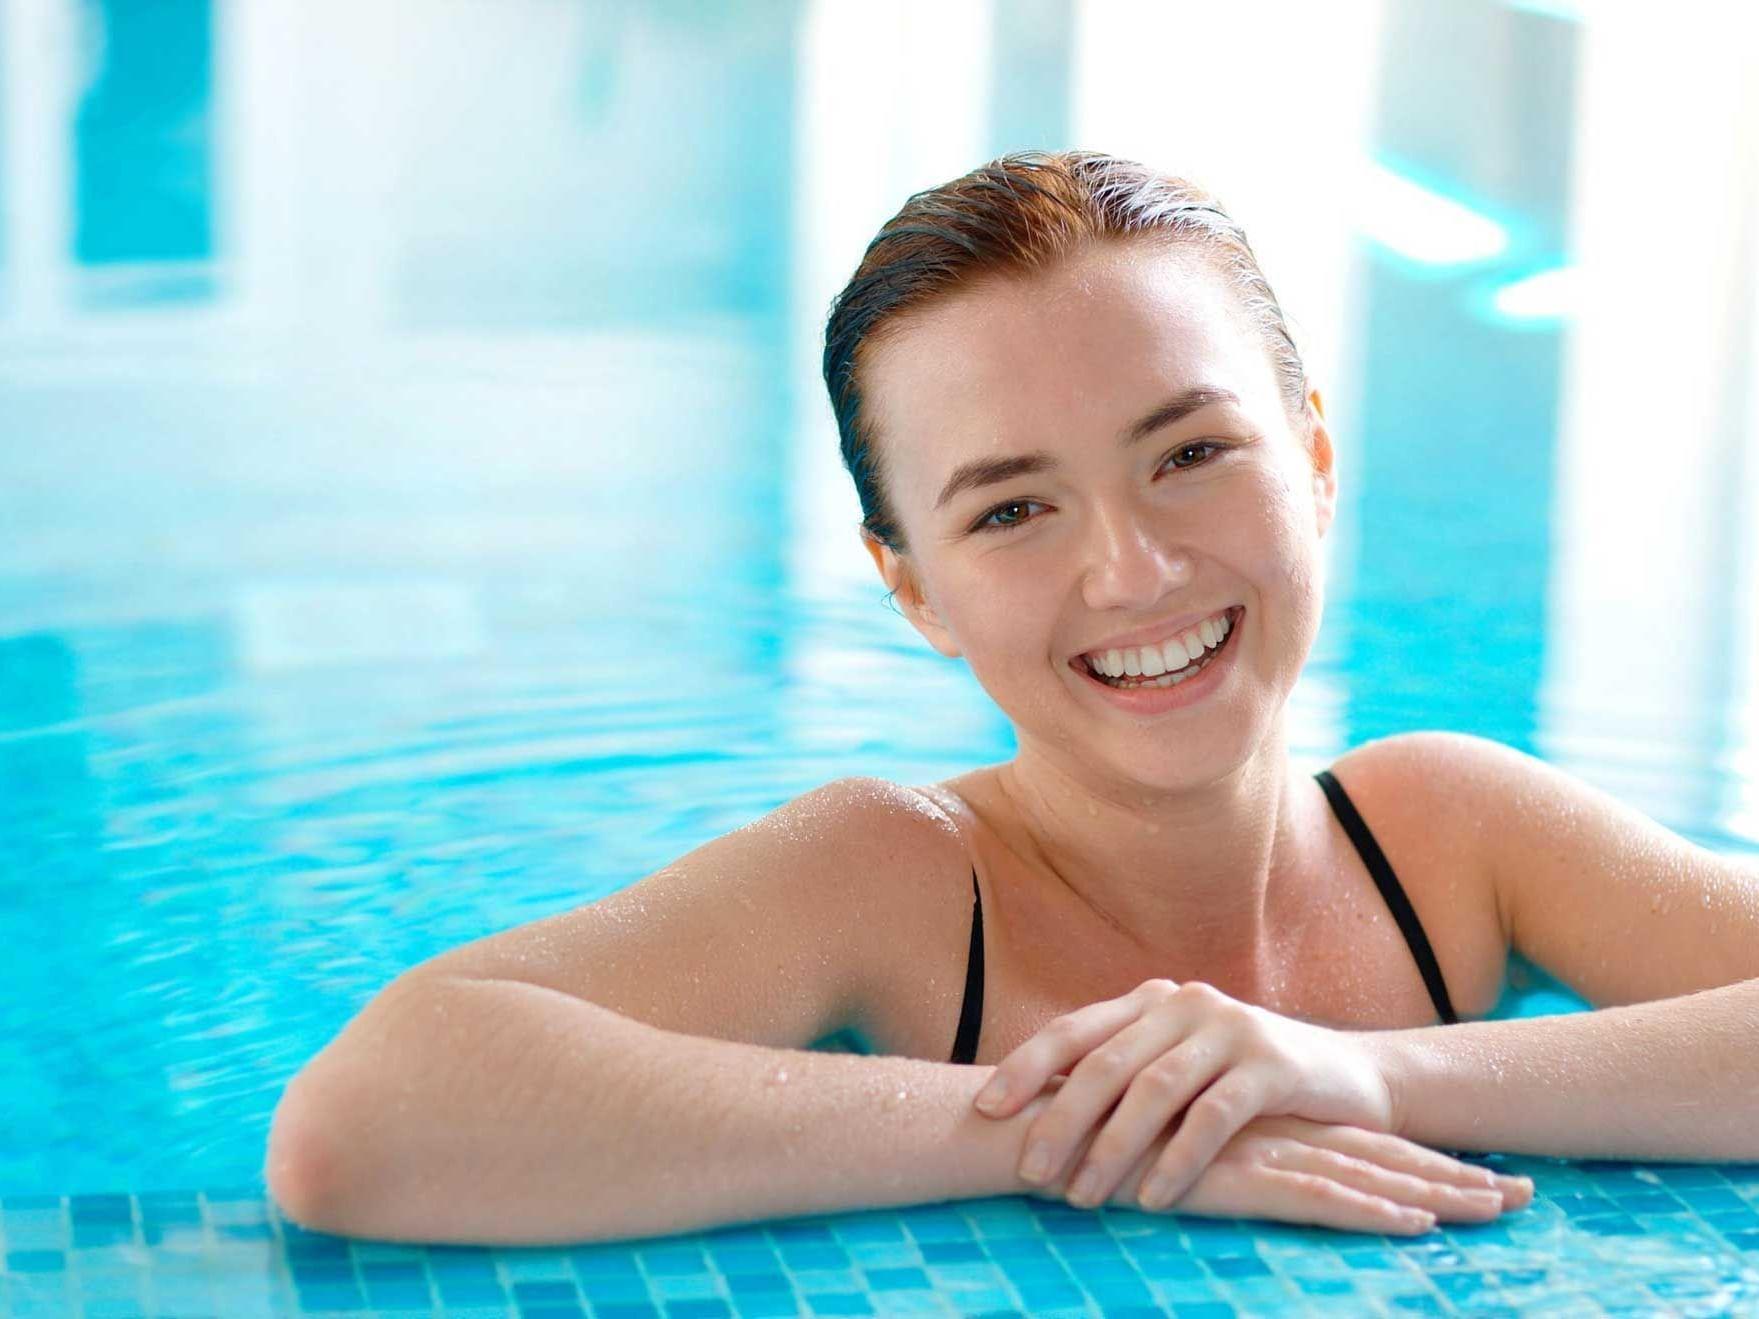 Lady smilling in swimming pool at Artyzen Grand Lapa Hotel Macau